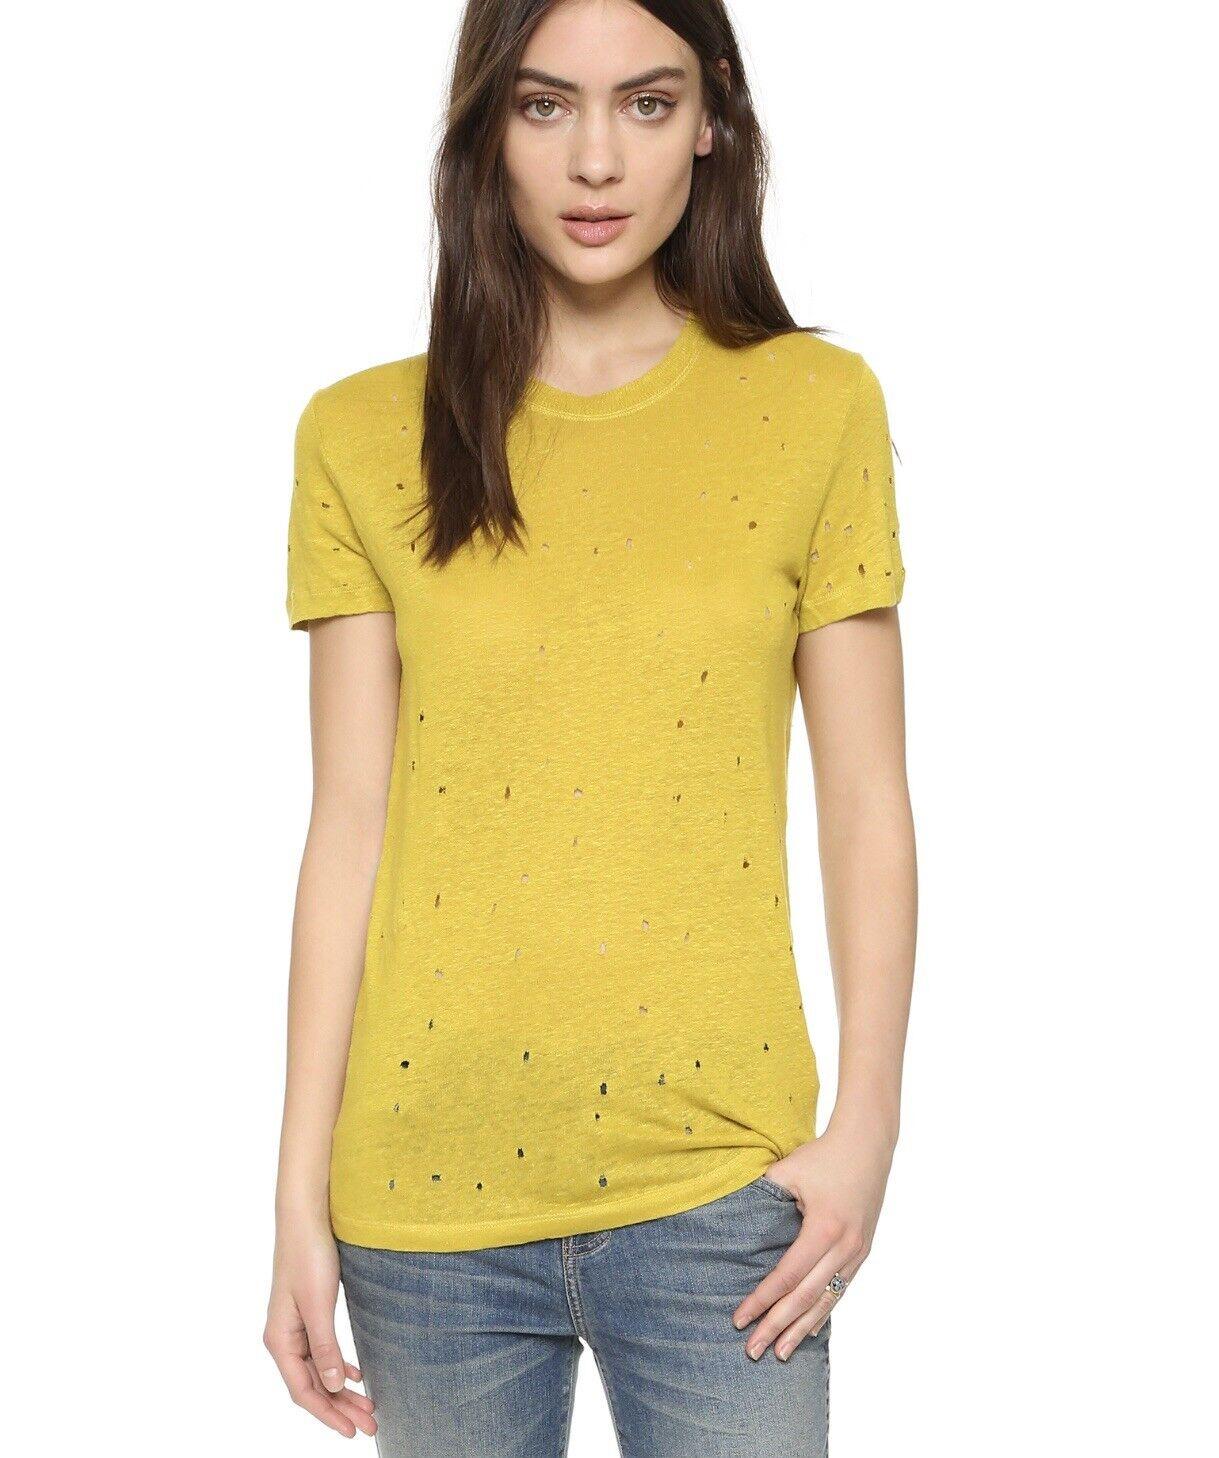 IRO Distressed Clay Top Yellow Linen T-shirt XS